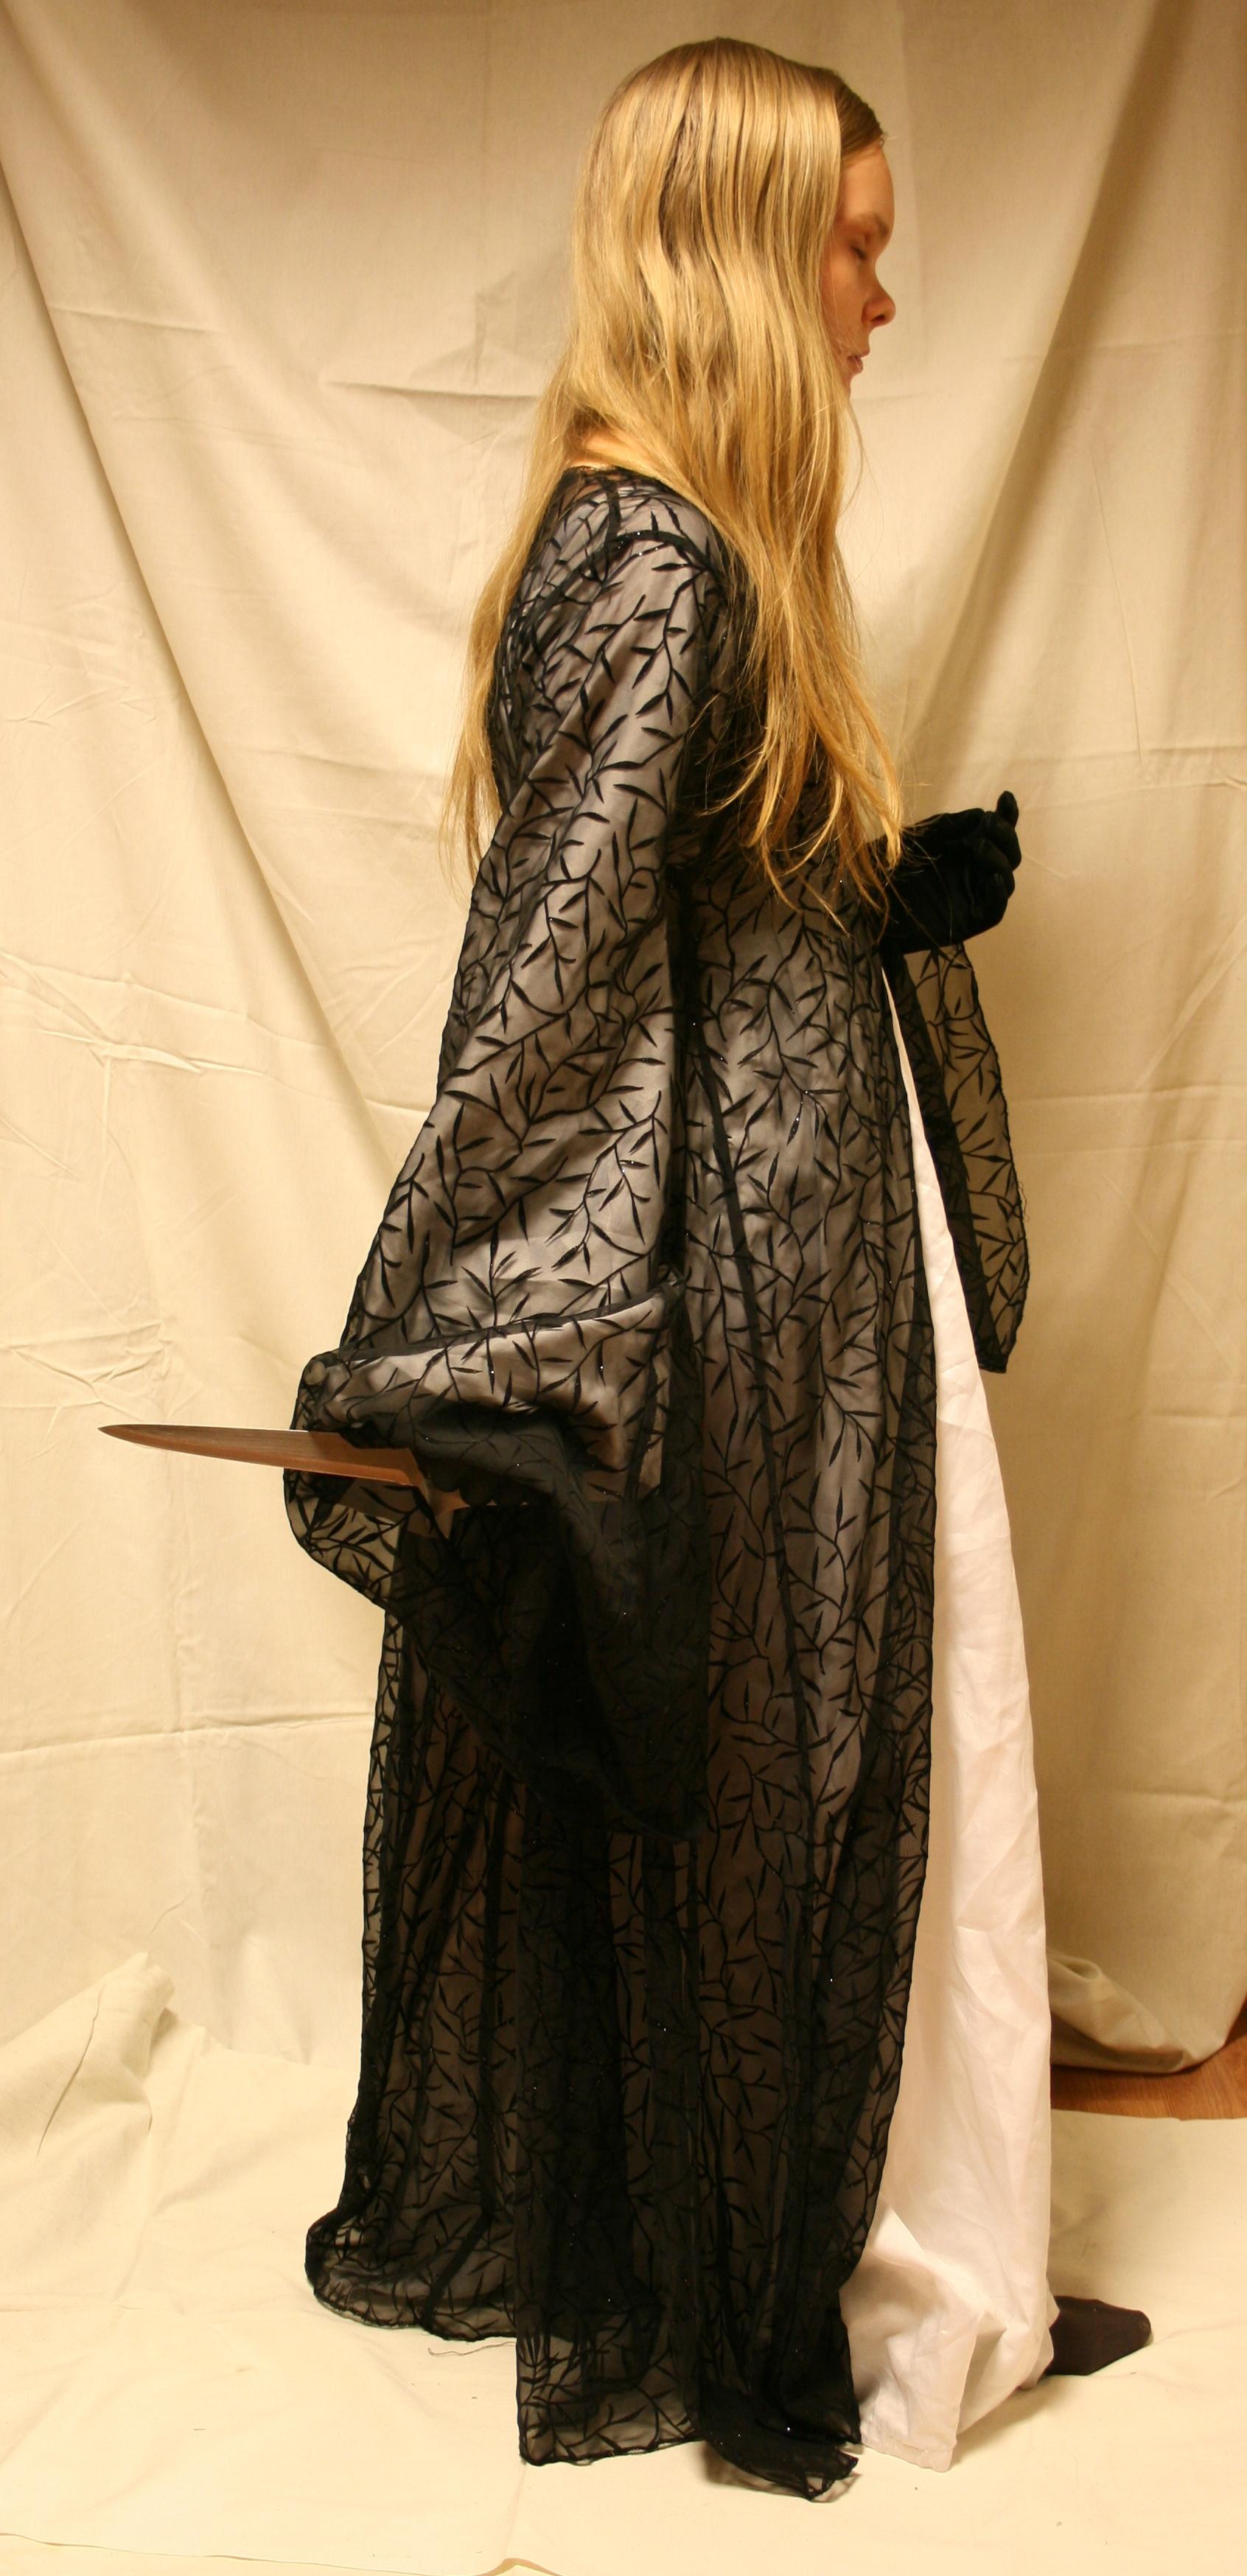 Ivonne with knife 5 by Iardacil-stock